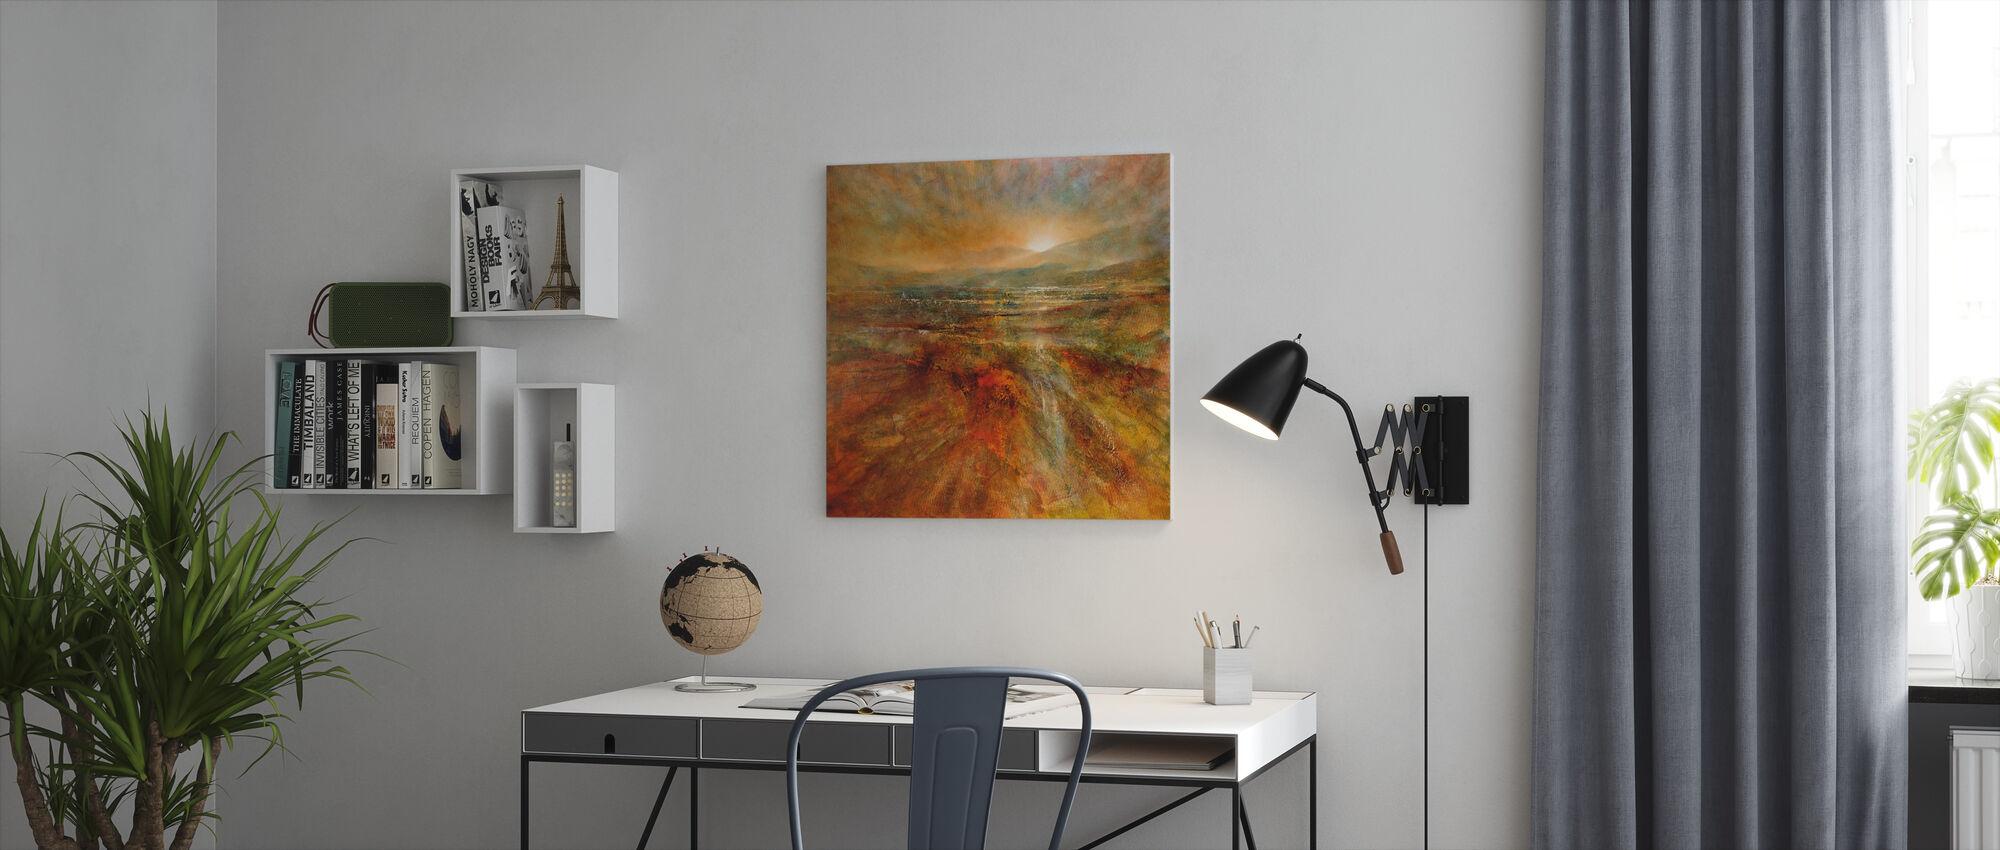 Sunrise - Canvas print - Office